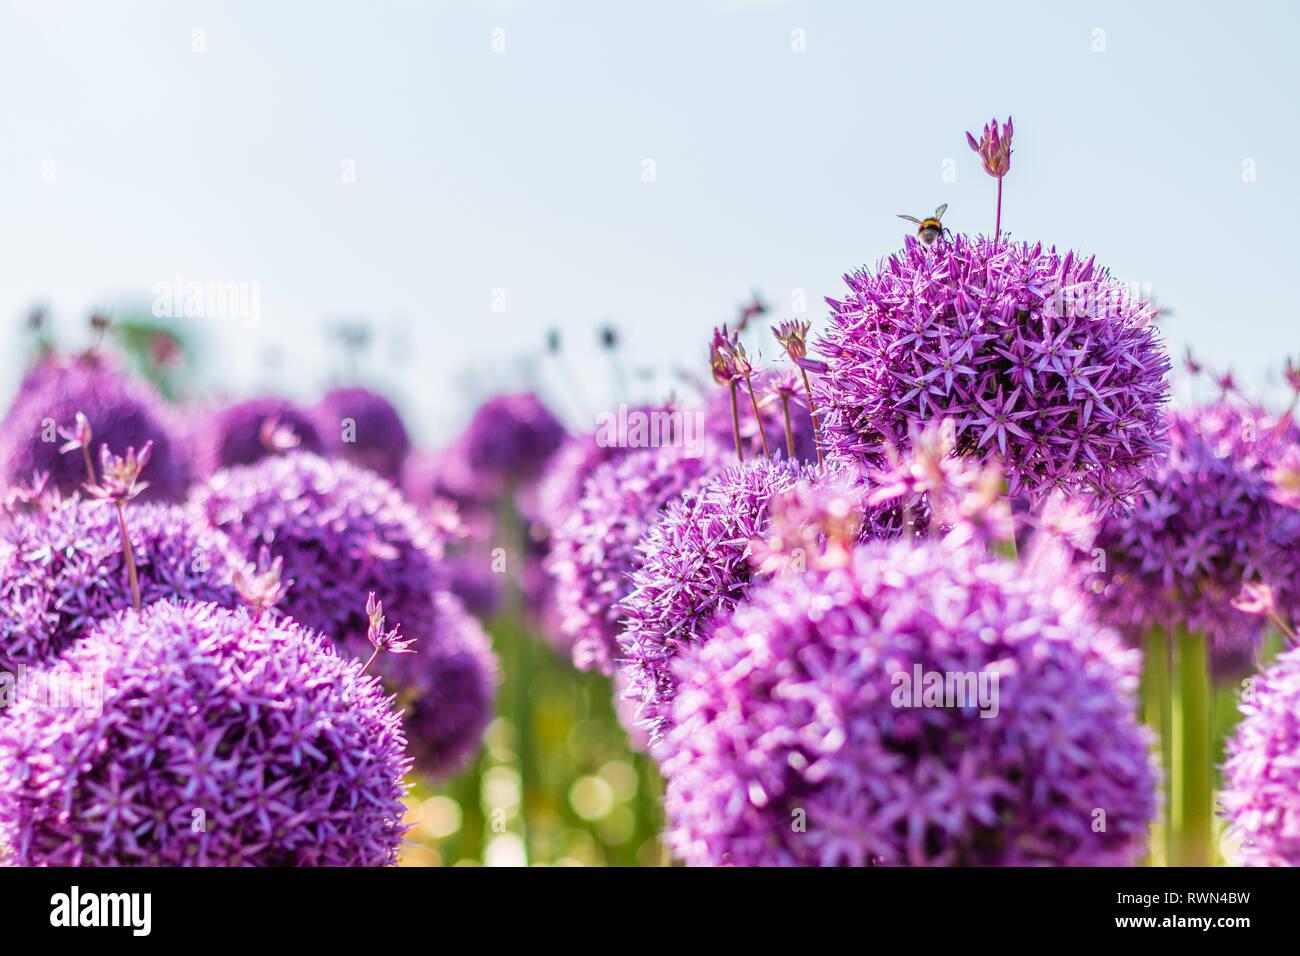 Bumblebee on beautiful purple star-spotted leeks - Stock Image